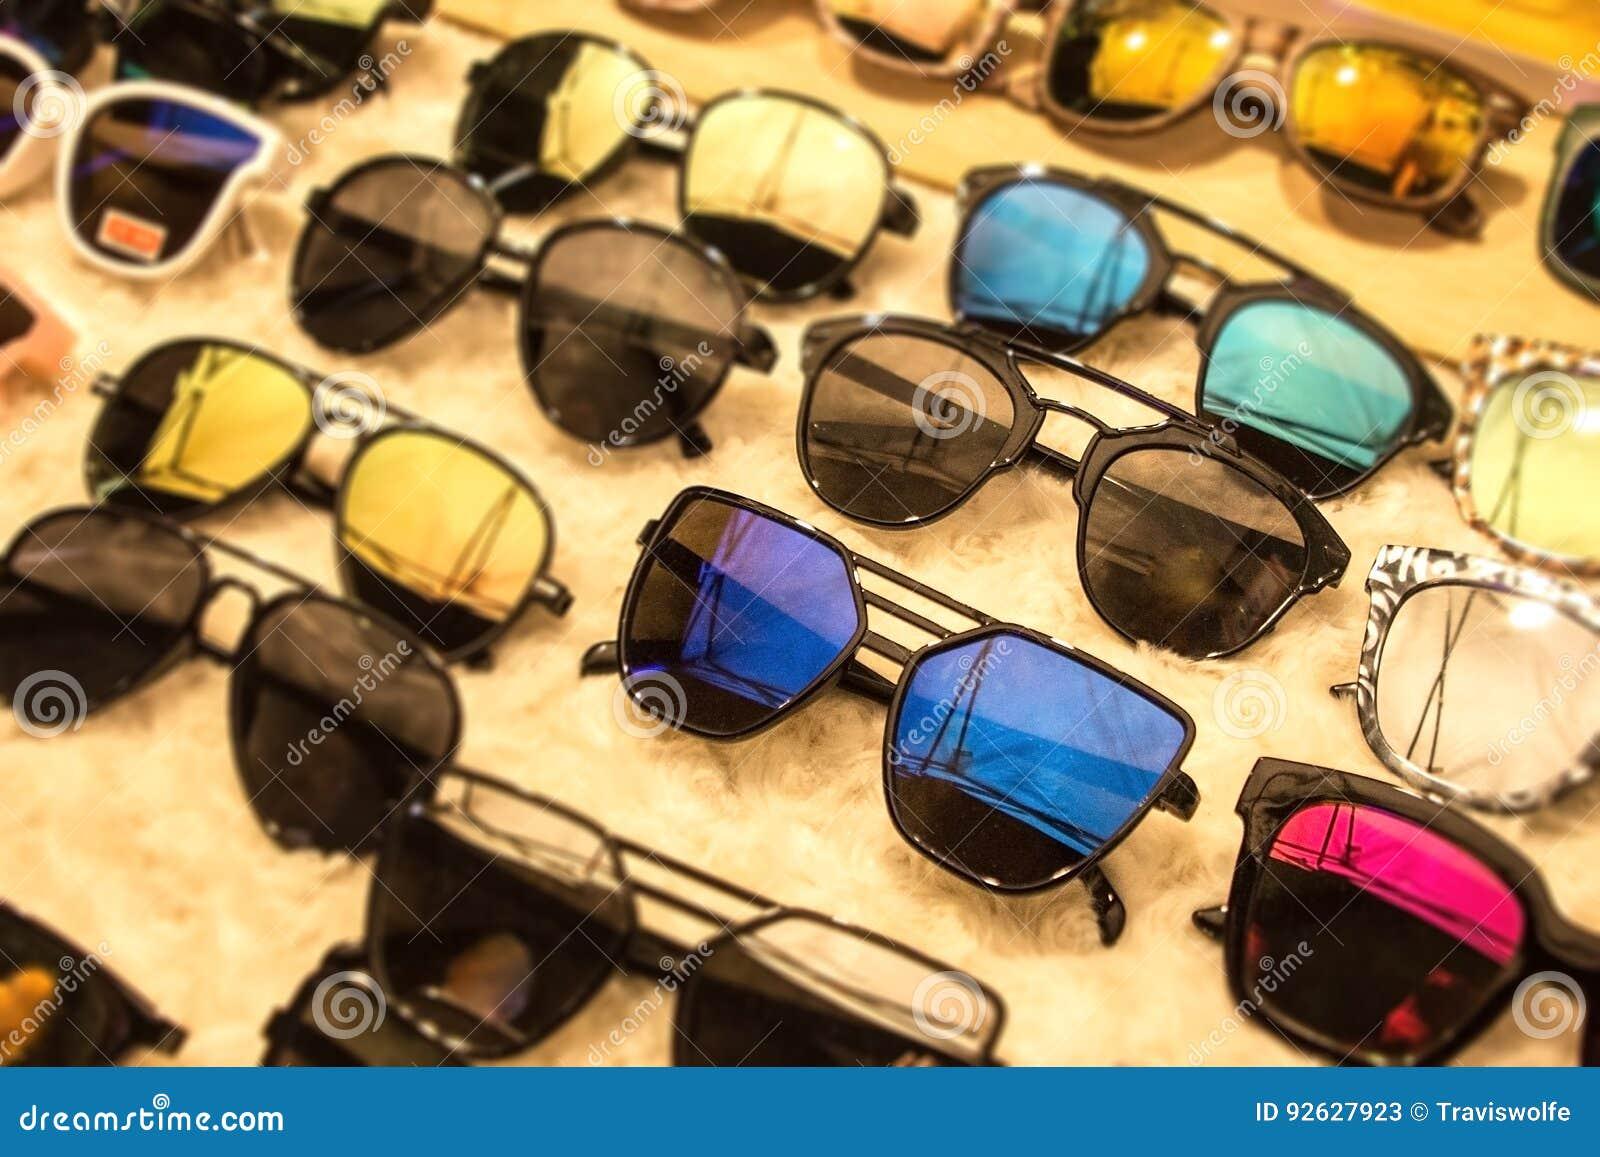 572f2b1e42 Download Γυαλιά ηλίου σε πολλές σκοτεινές UV σκιές για τις διαφορετικές  μορφές Αγορές για τις εκπτώσεις